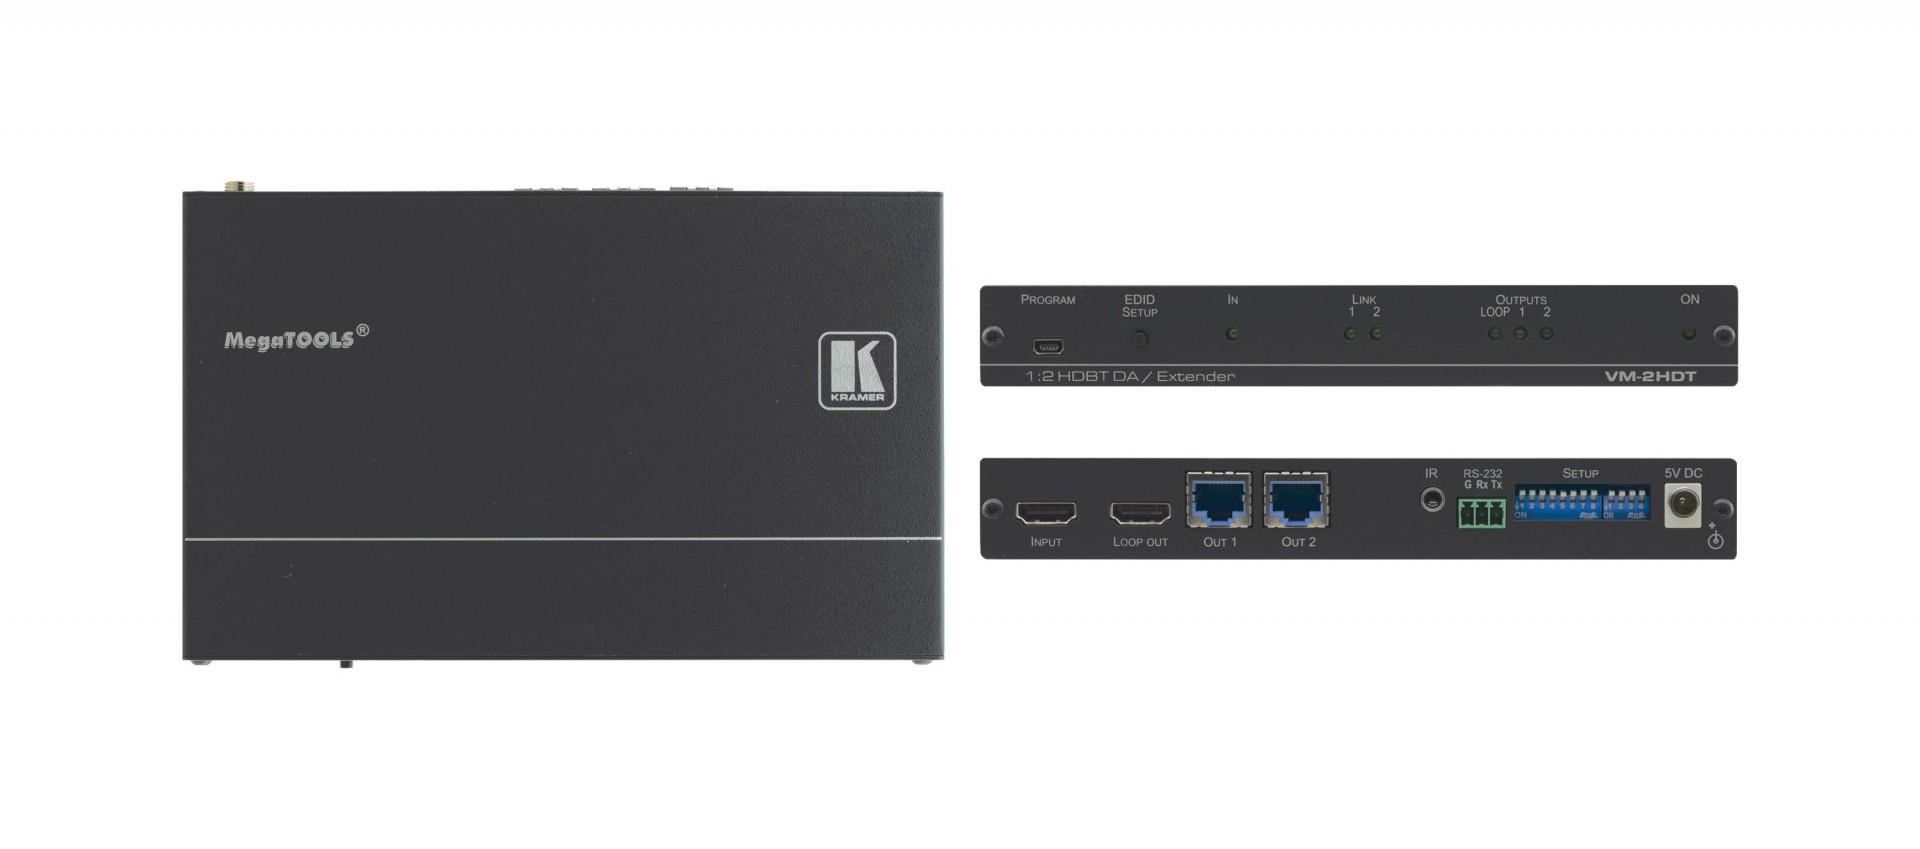 Kramer 1:2+1 4K60 4:2:0 HDMI long?reach HDBaseT extender- VM-2HDT